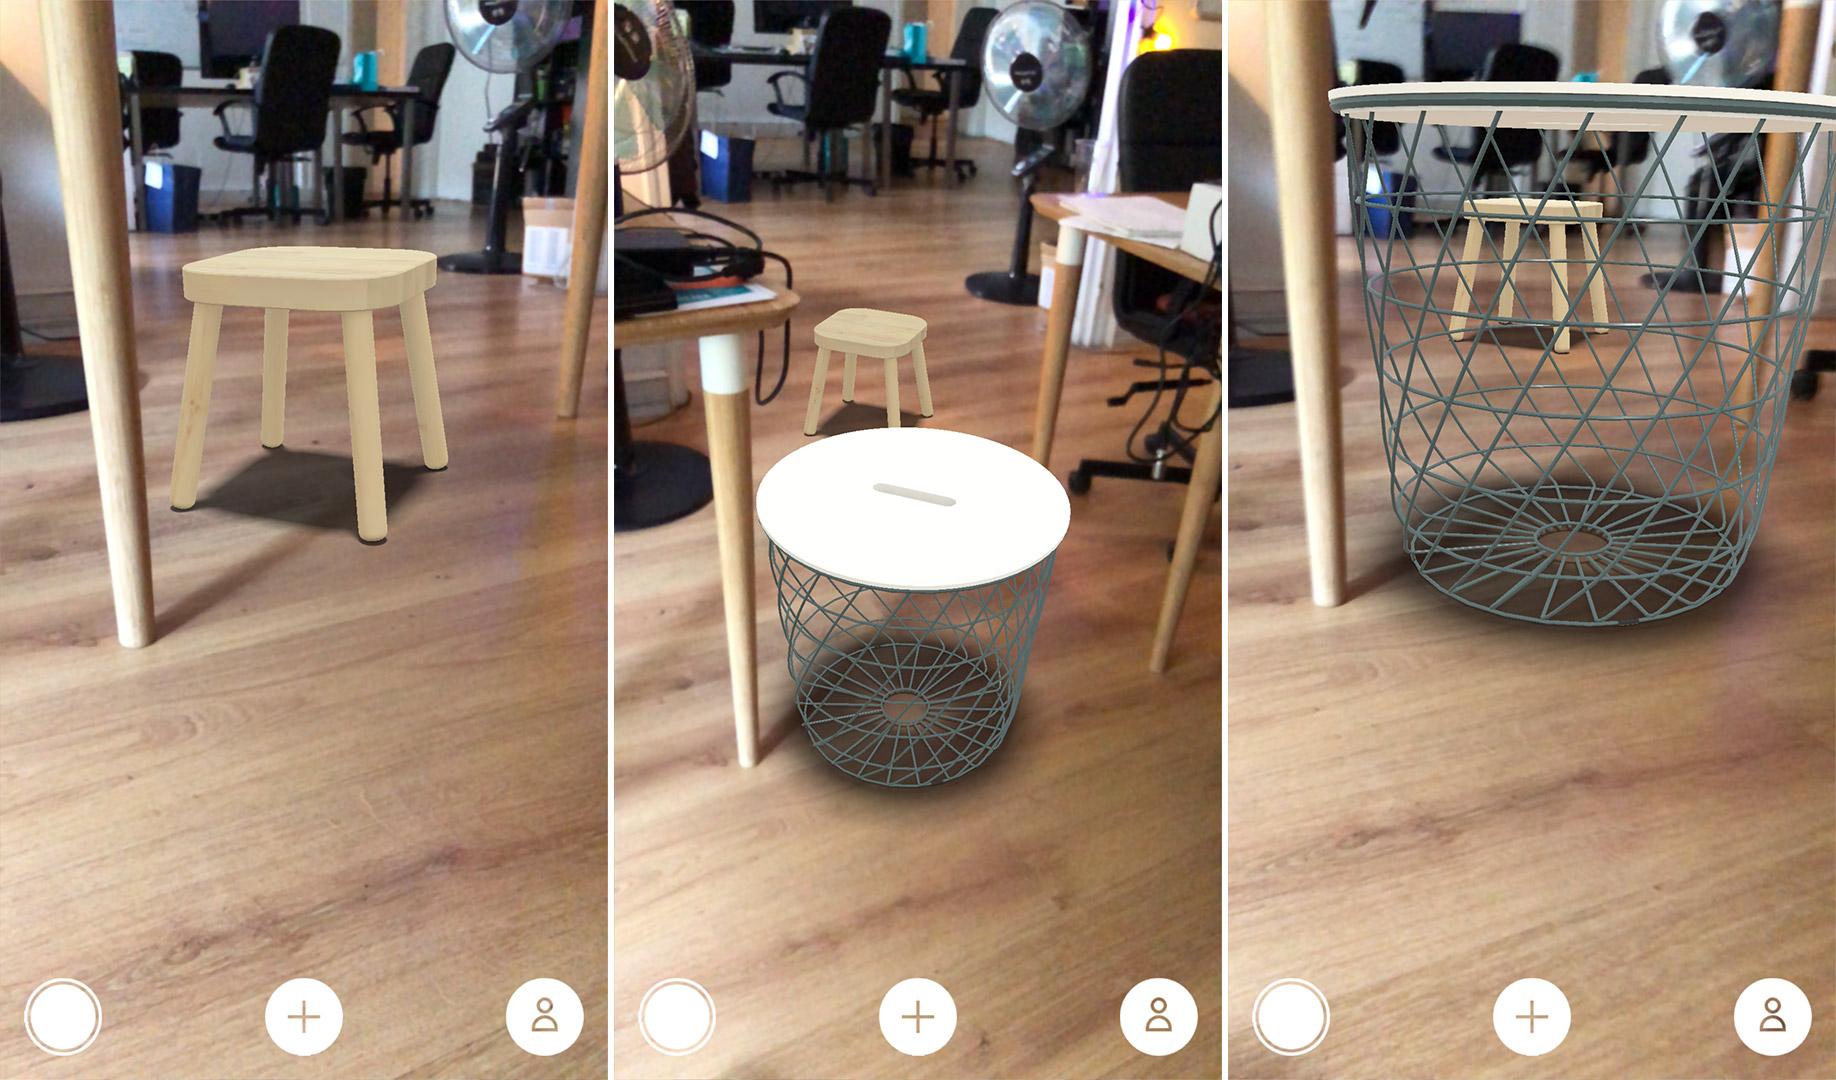 apple prochainement un casque de r alit augment e tunupdate. Black Bedroom Furniture Sets. Home Design Ideas